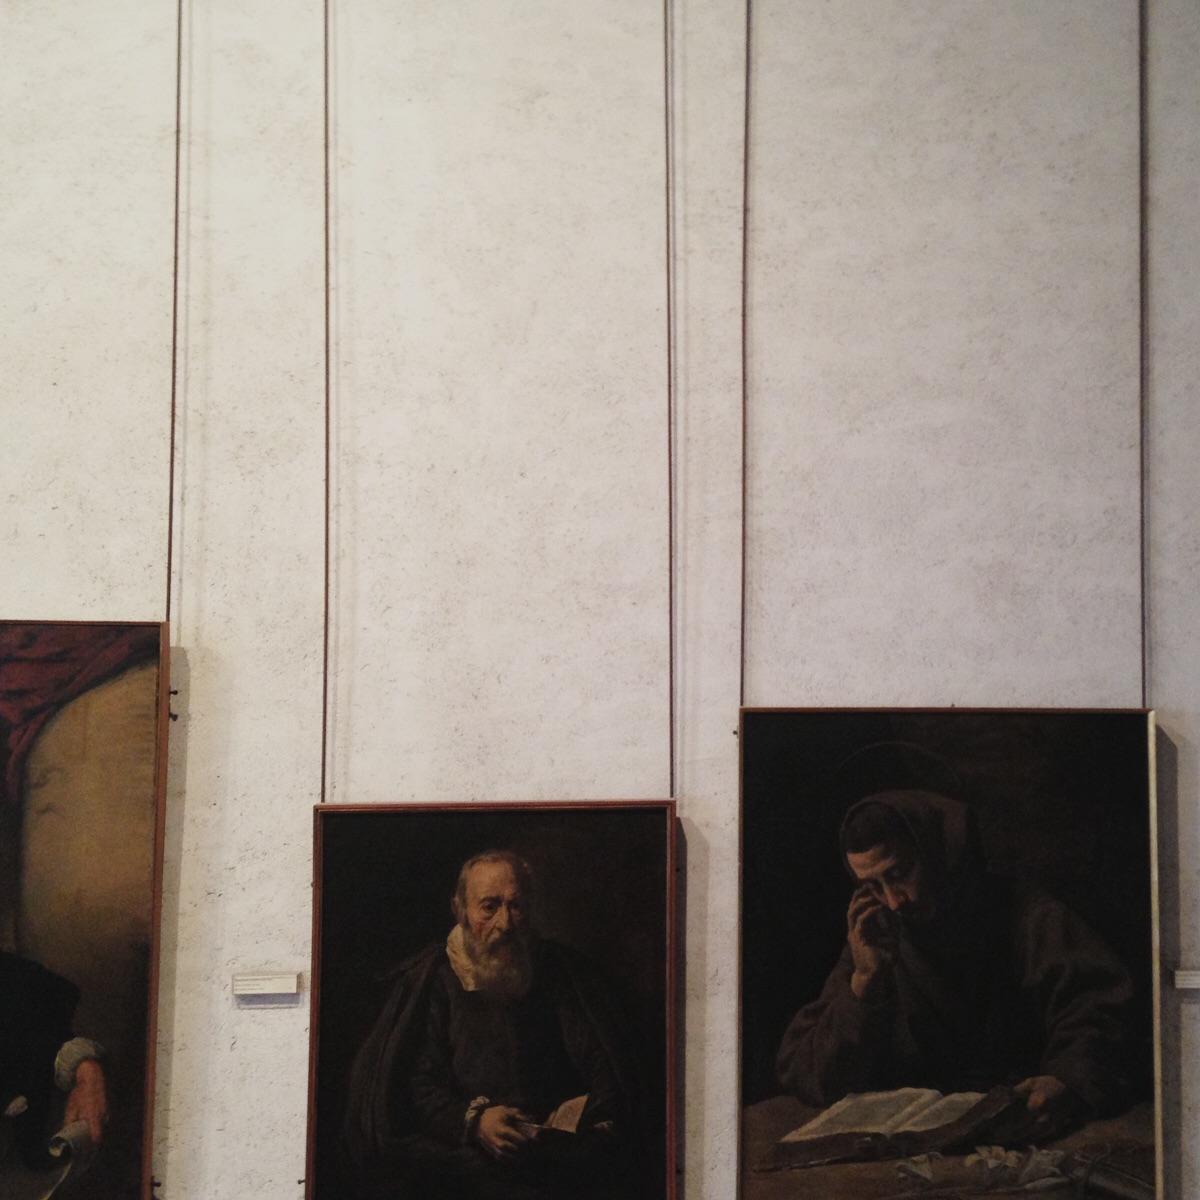 Art . castelvecchio museum, Verona. (Scarpa, restored 1973)